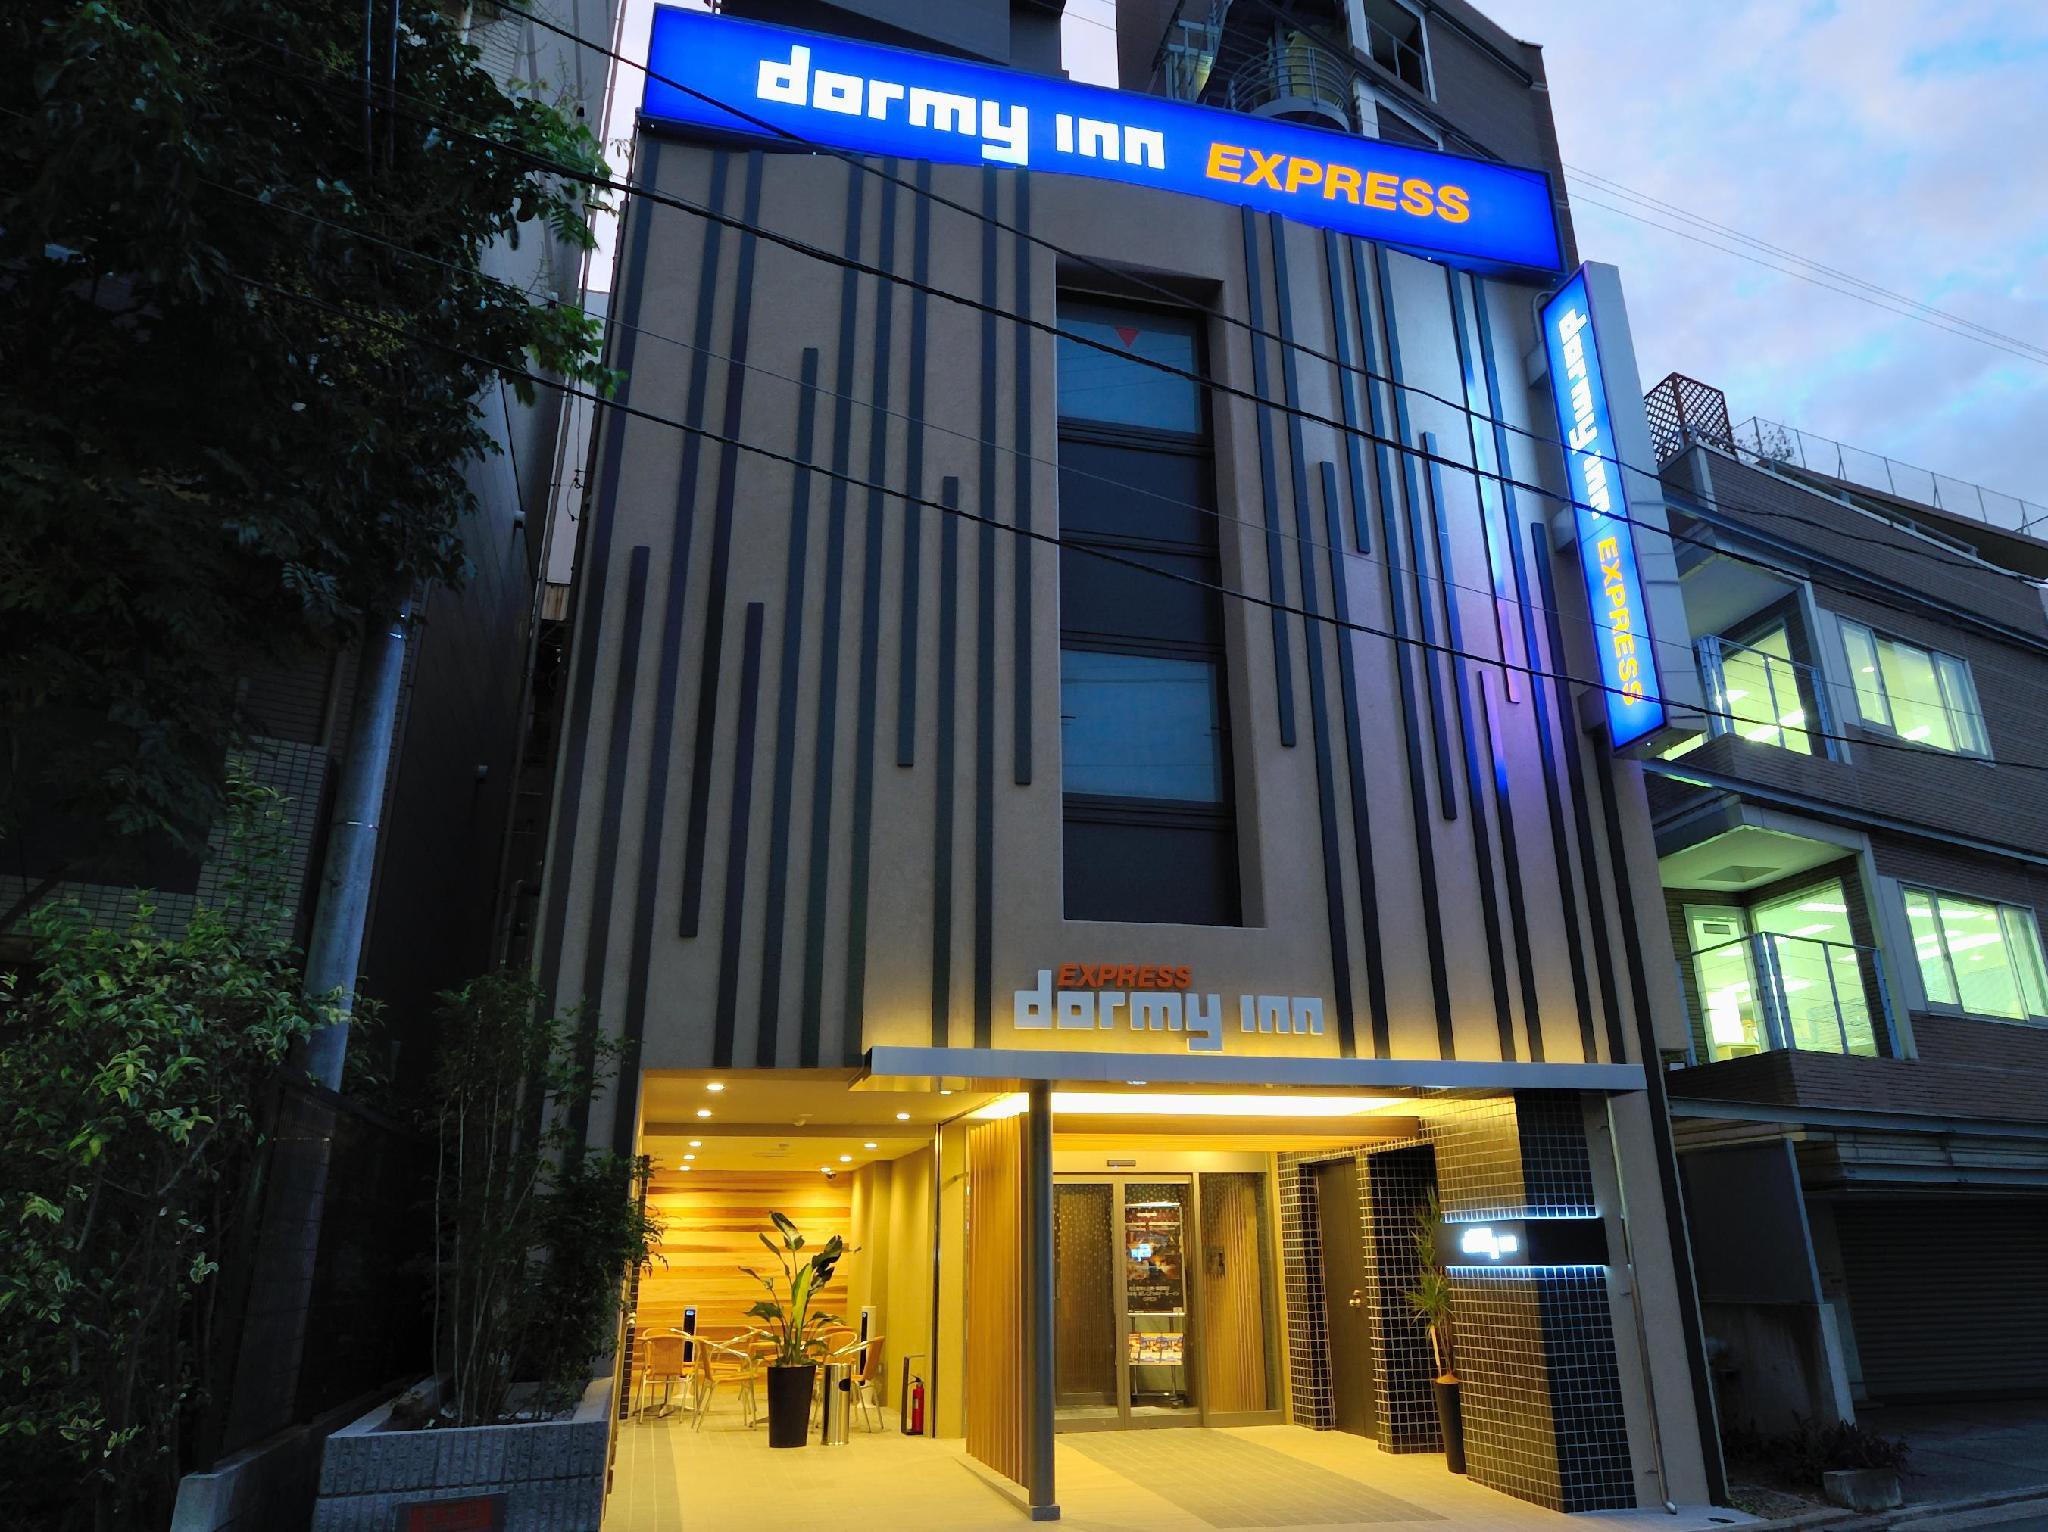 Dormy Inn快捷酒店 - 目黑青葉台溫泉 Dormy Inn EXPRESS Meguro Aobadai Hot Spring